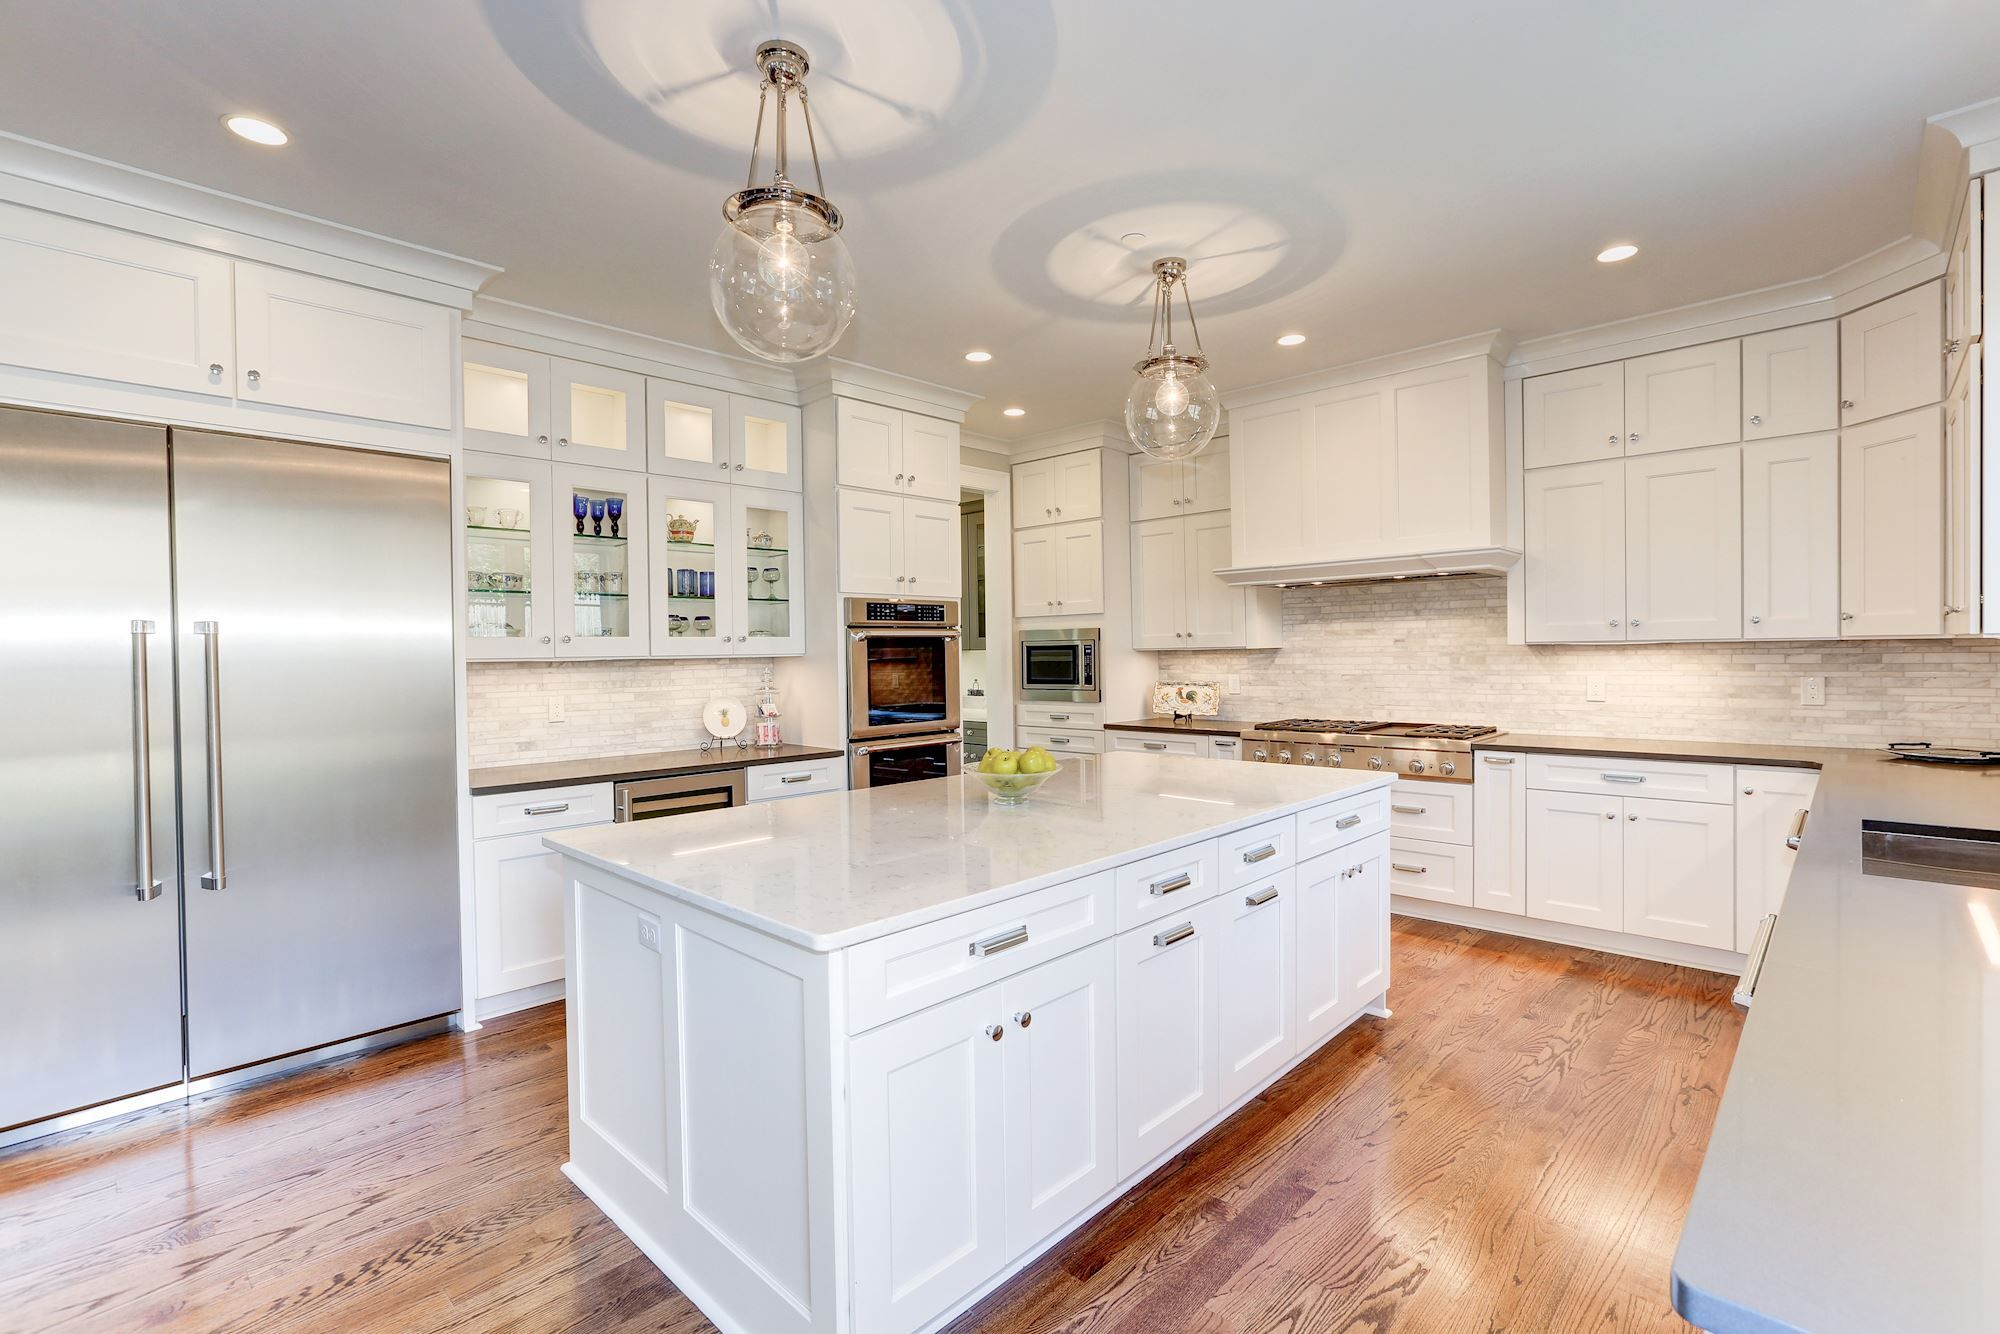 Semi Custom Kitchen Wellborn Cabinets Kitchen Inspirations New Kitchen Designs